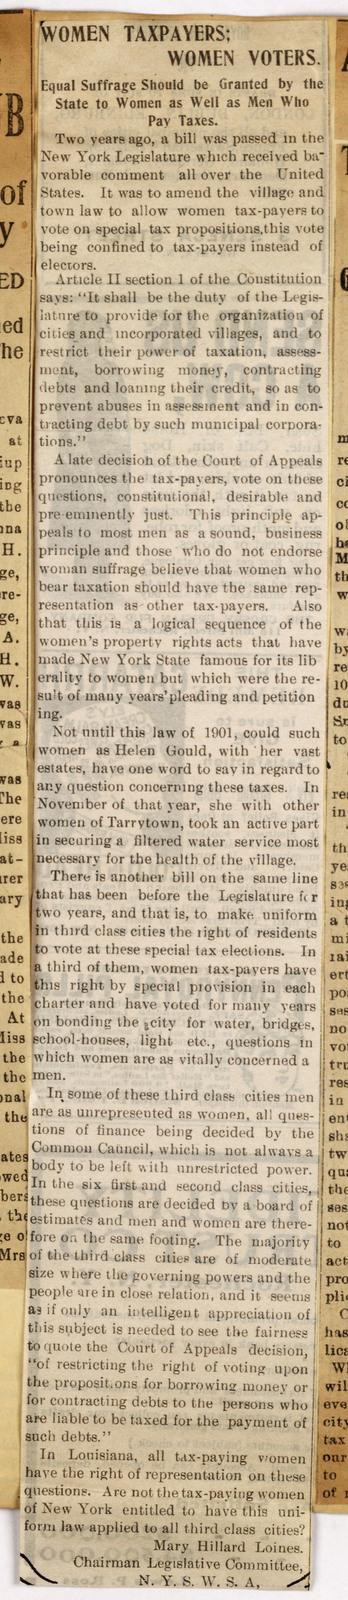 Women Taxpayers; Women Voters